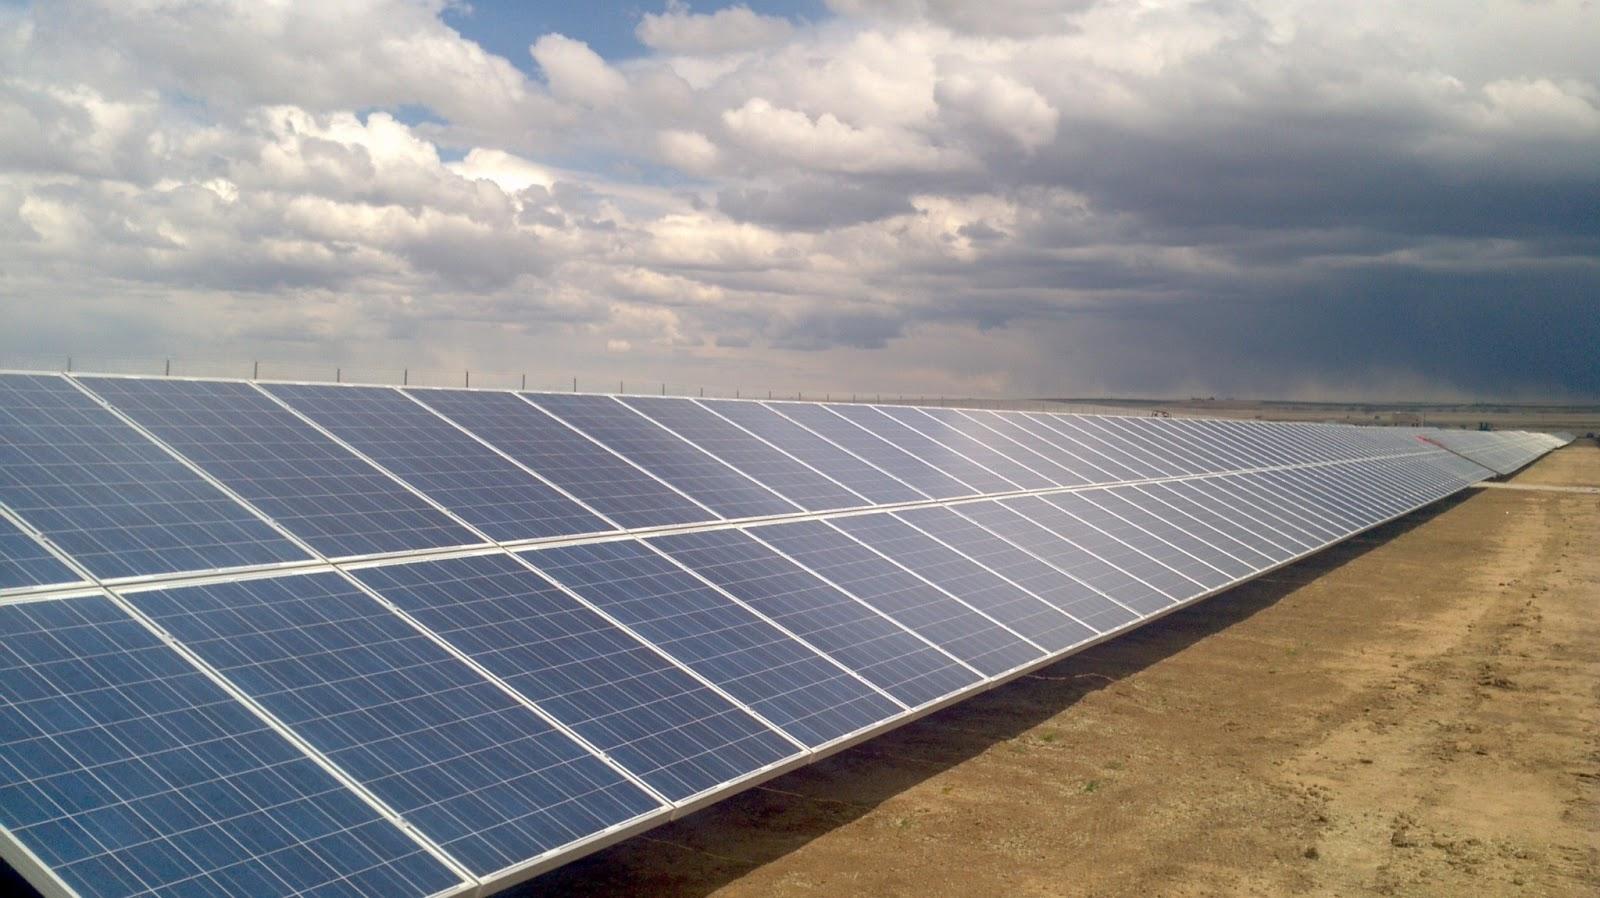 solarpanelsjasper.jpg